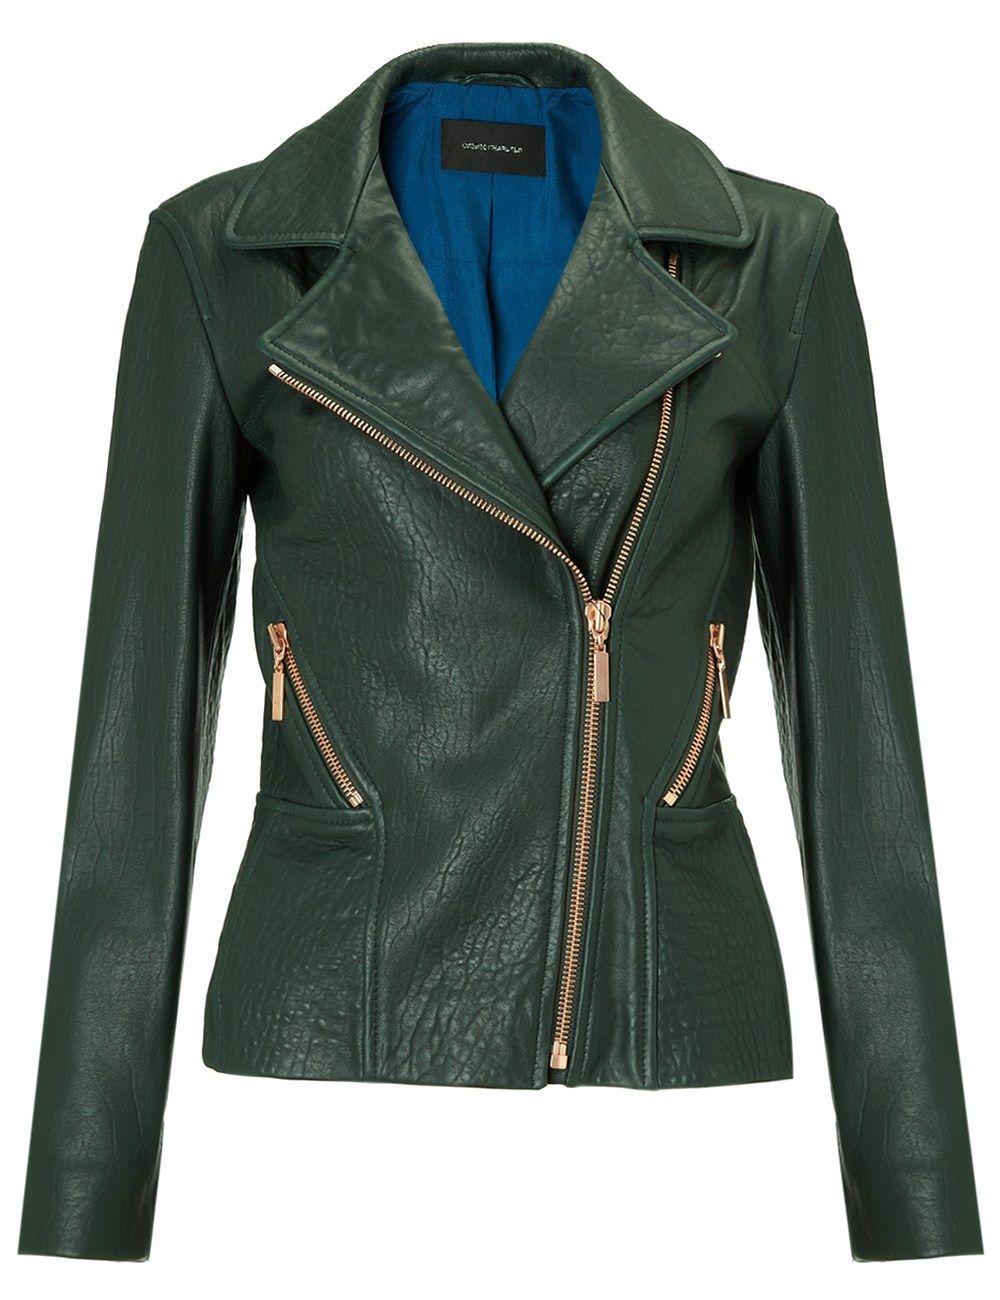 678f35341ed44 Dark Green Leather Jacket